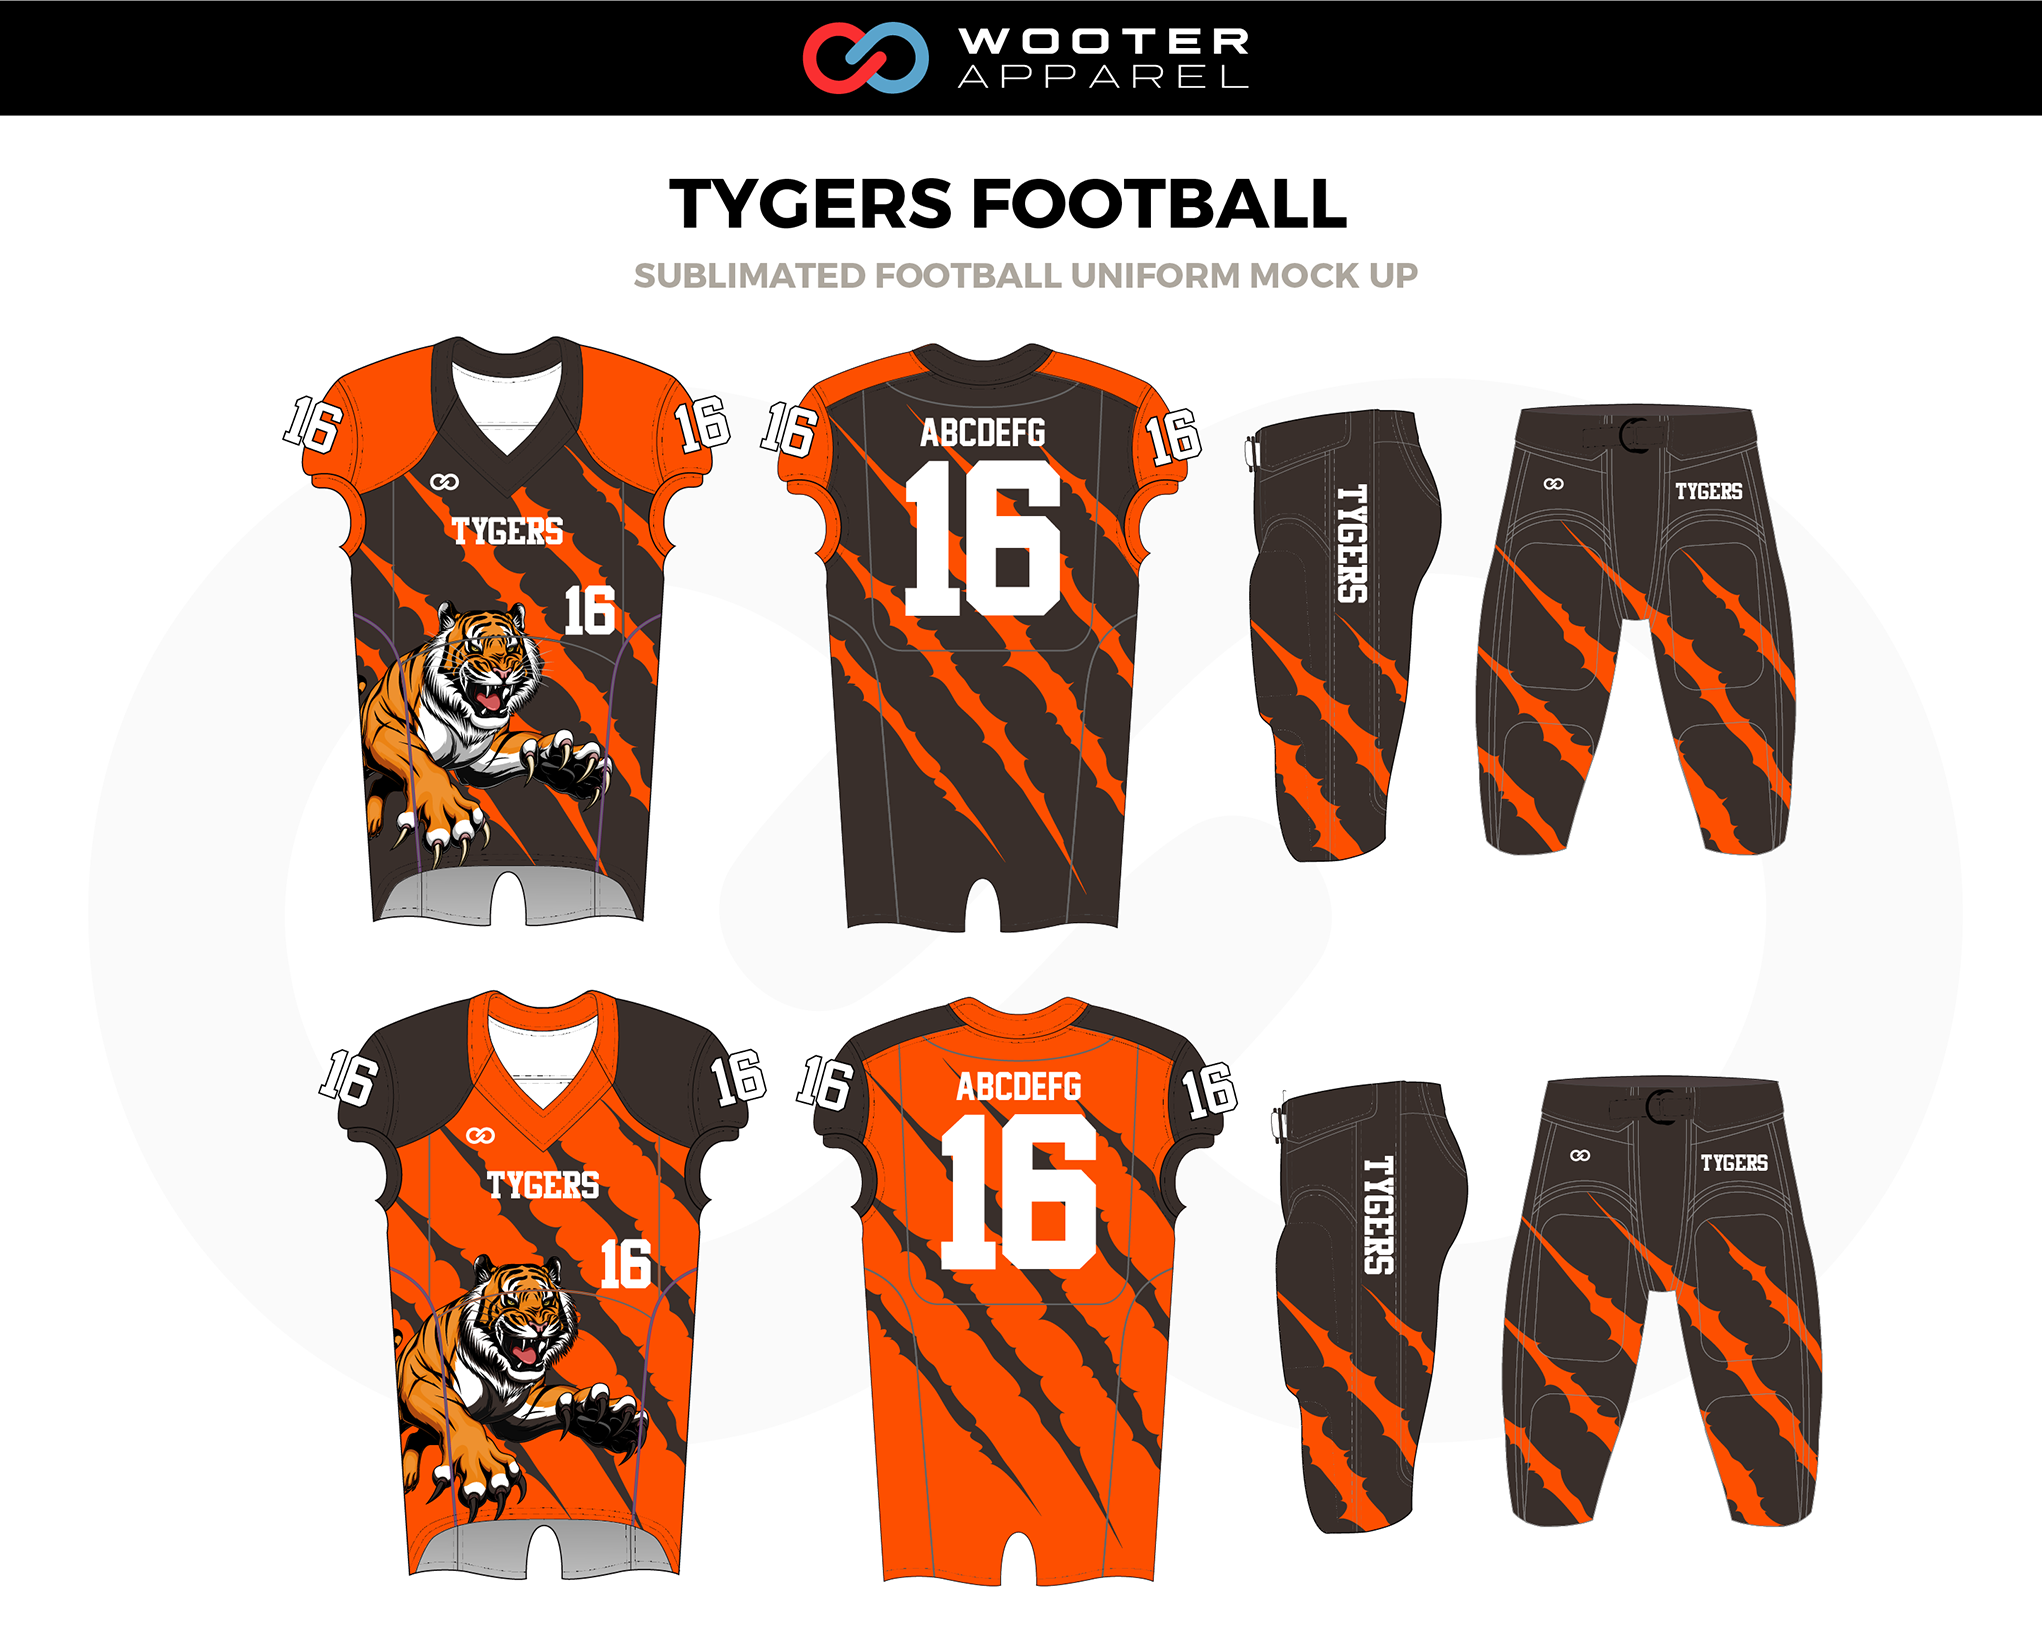 Football Designs Custom Football Uniform Jersey Designs Wooter Apparel